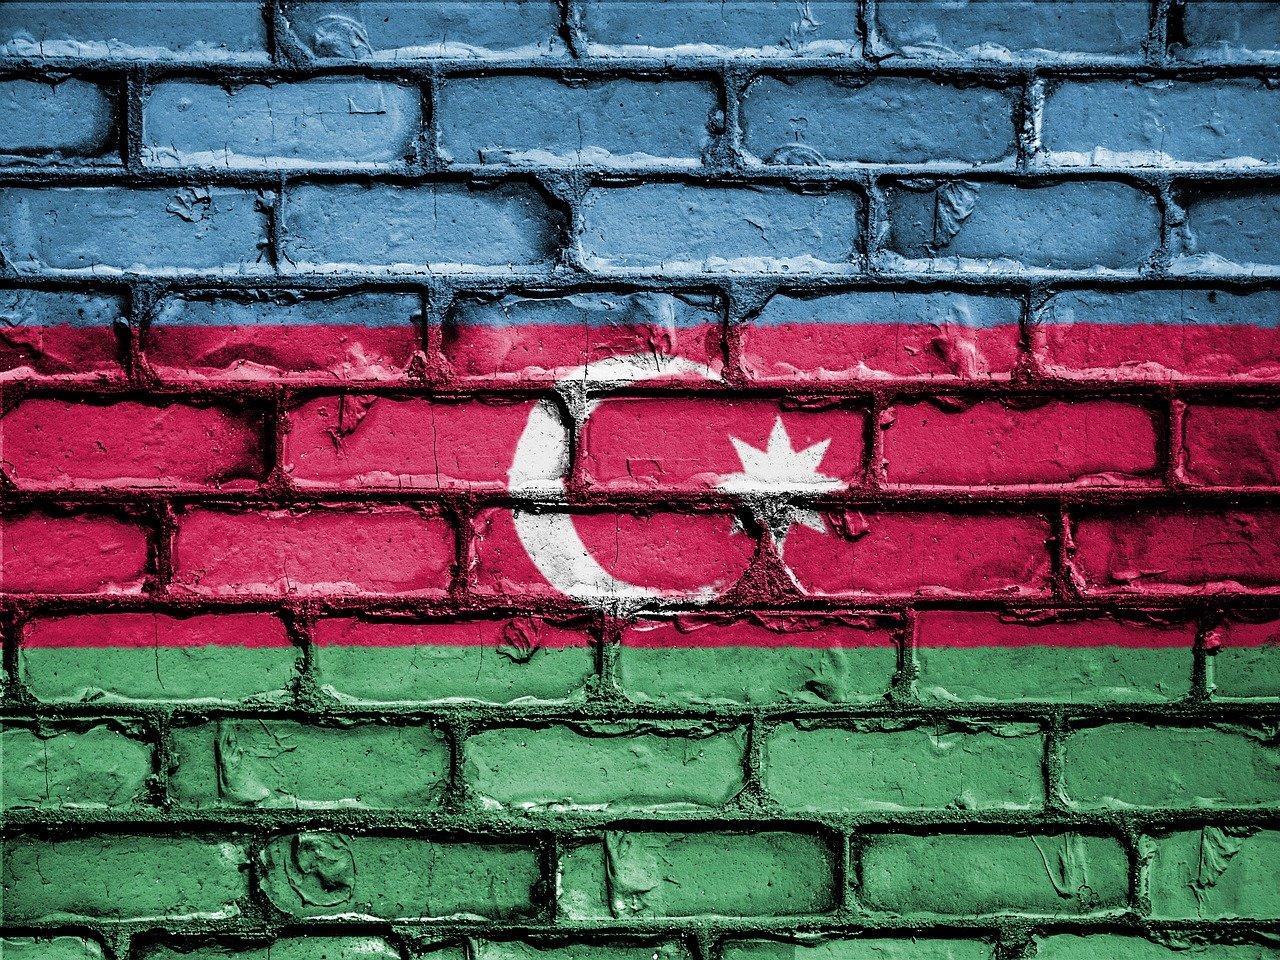 Азербайджан — о резолюции сената Франции по Нагорному Карабаху: обычный листок бумаги